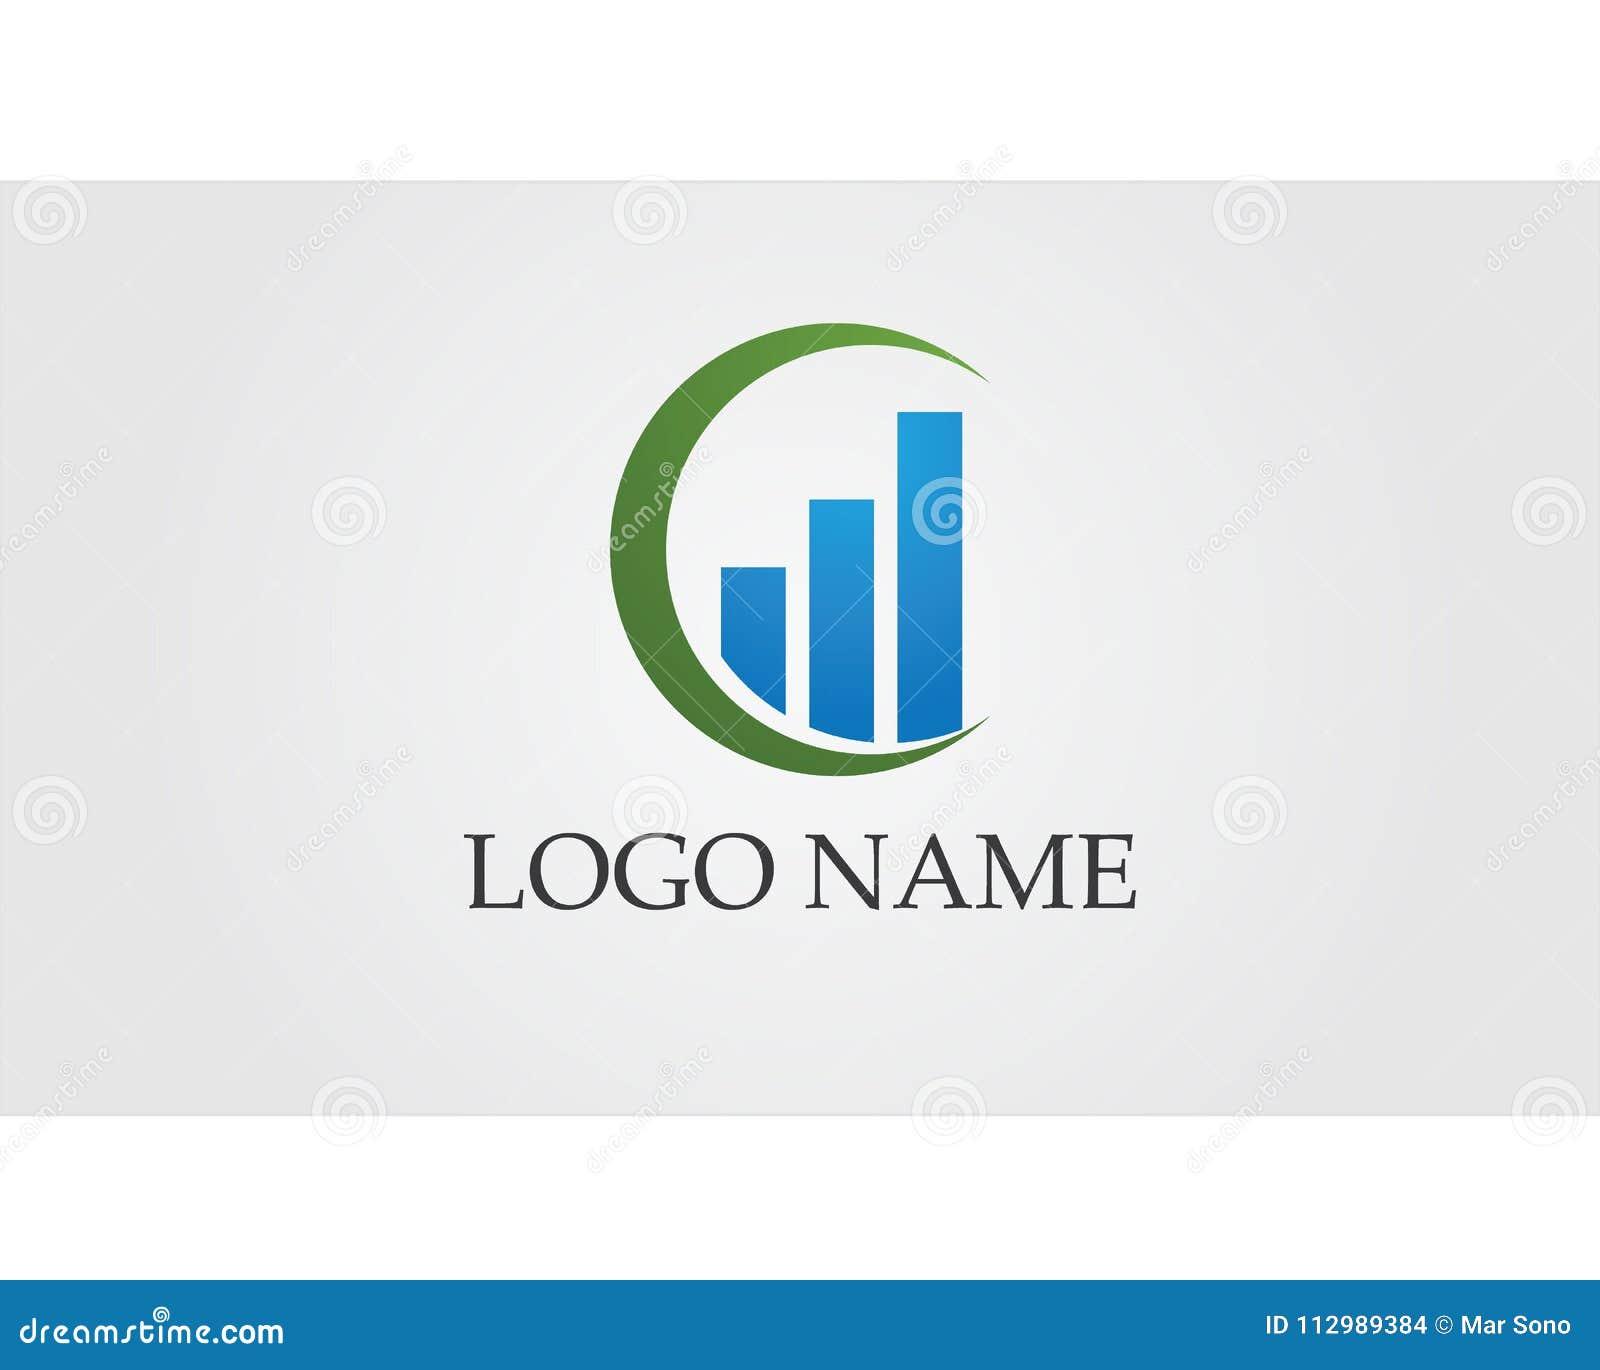 Business finance logo and symbols vector concept illustration..